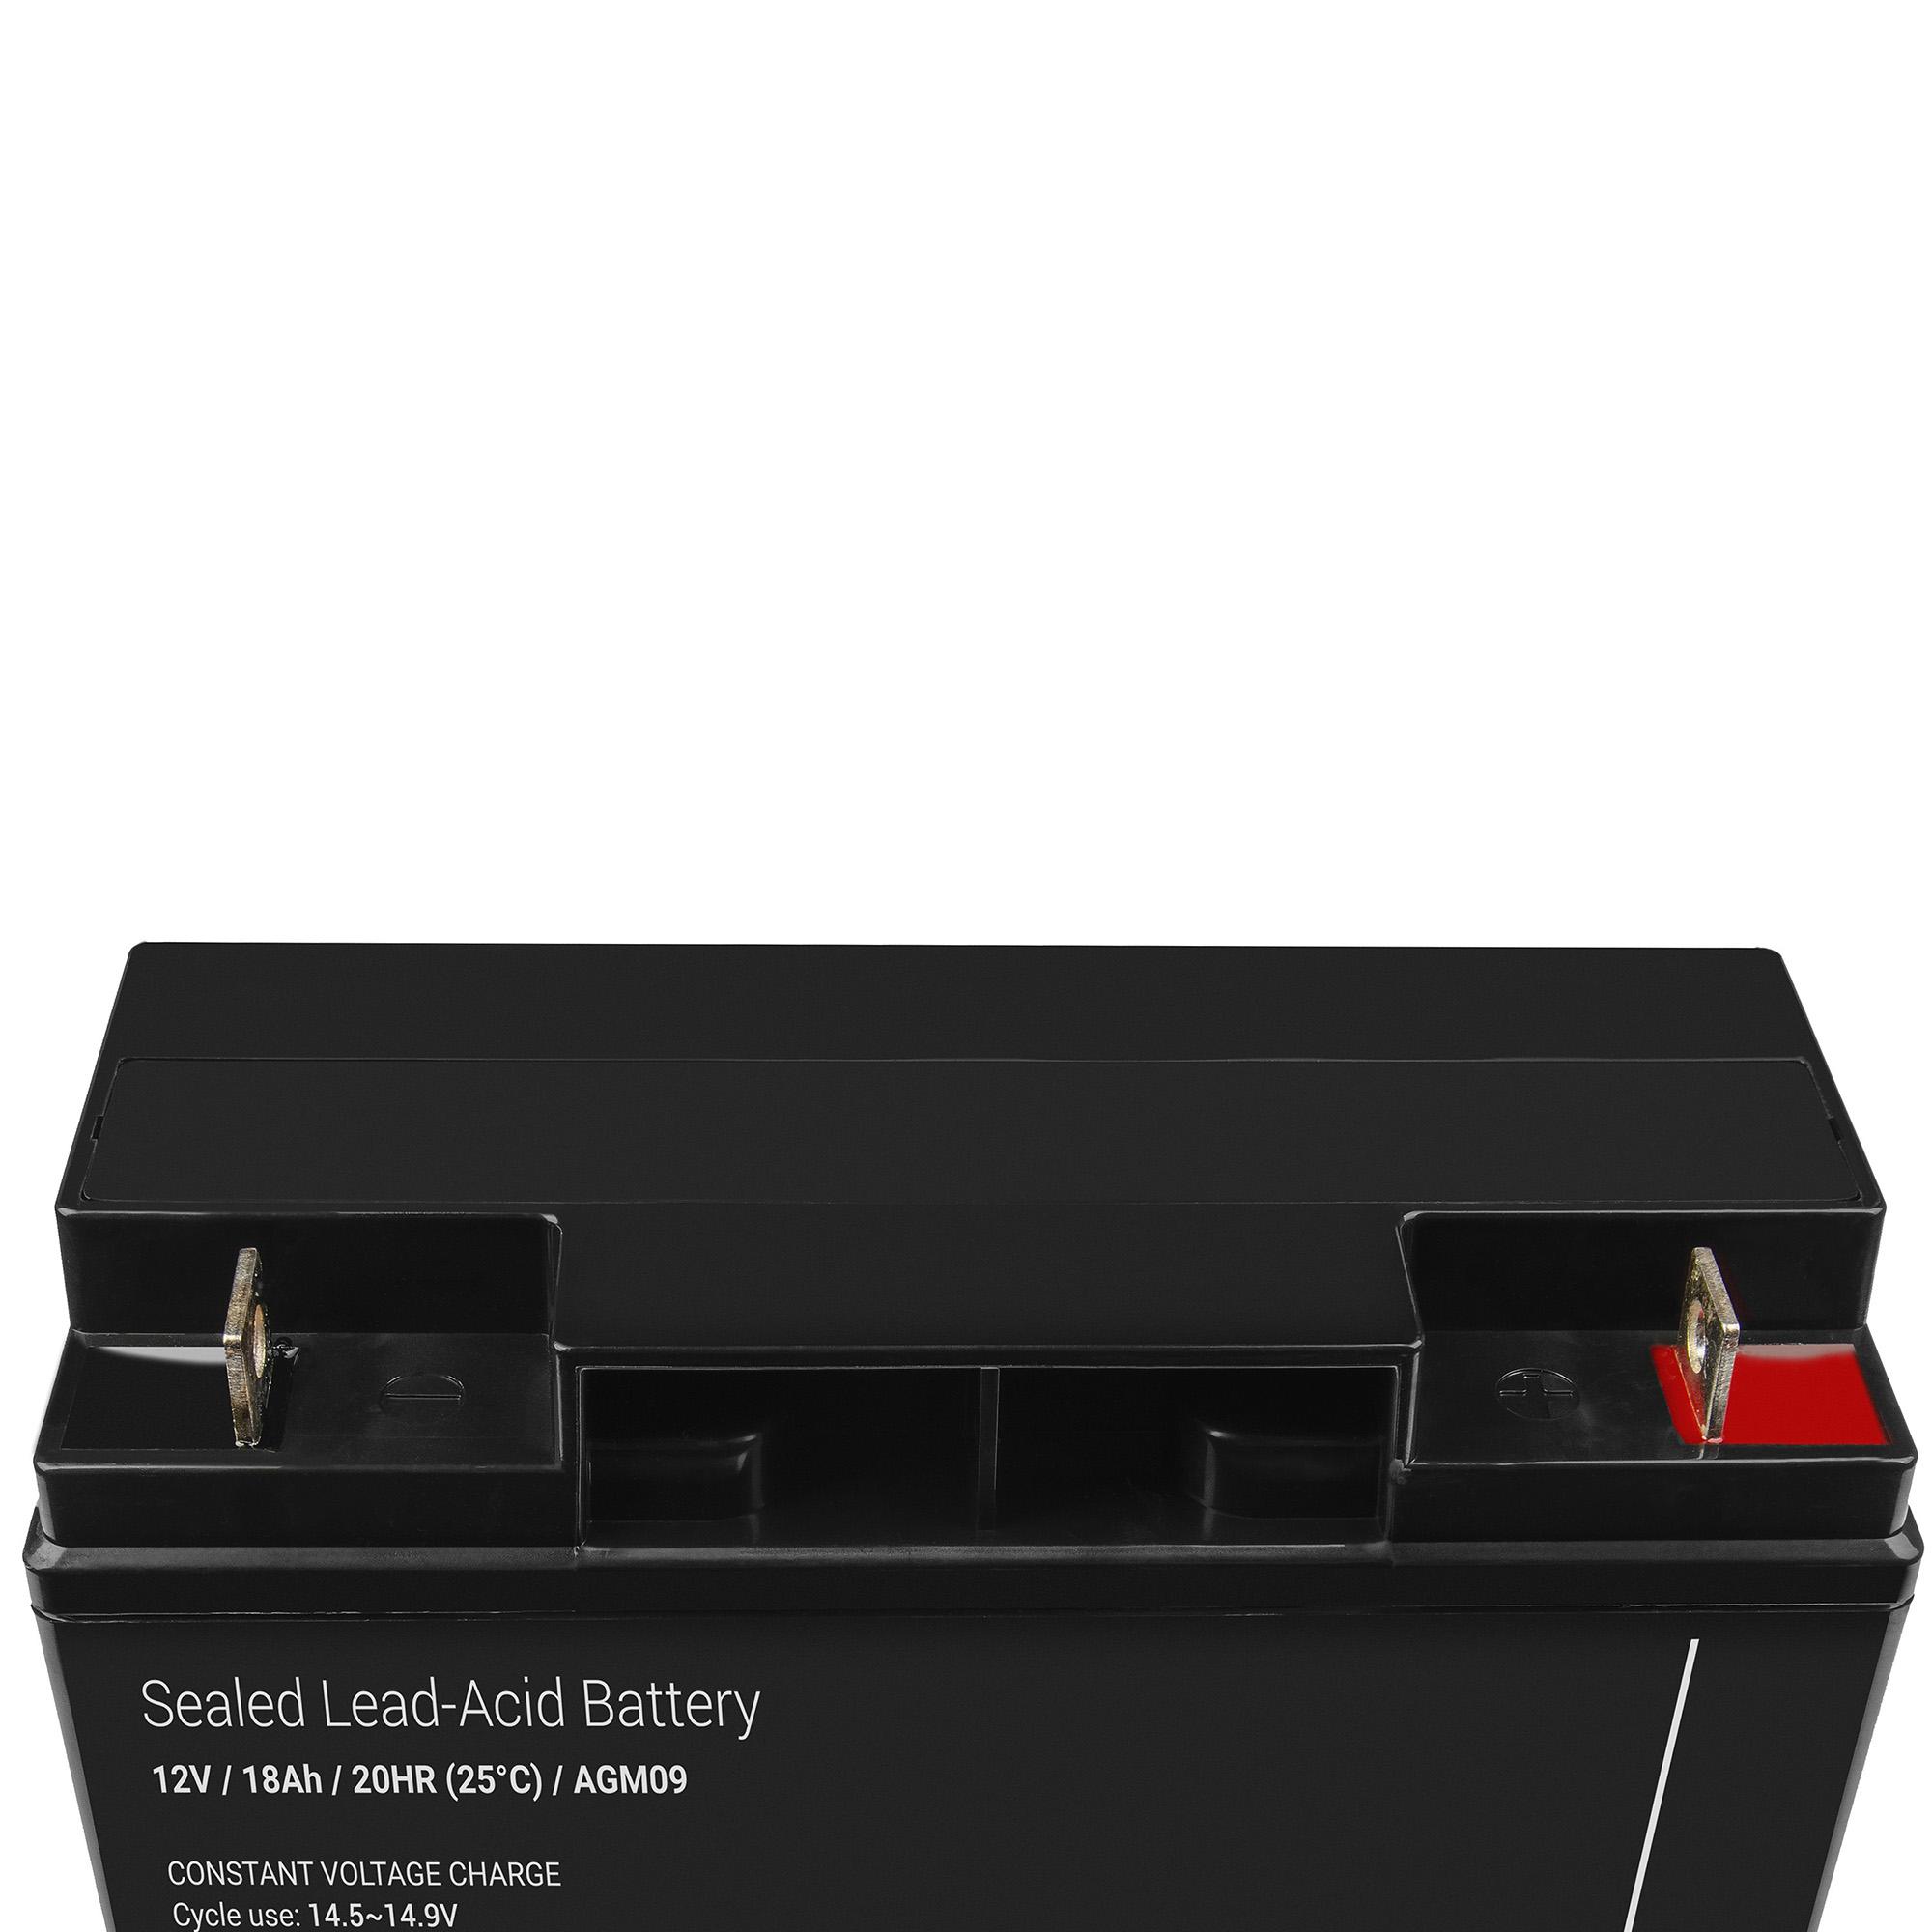 agm vrla battery for apc smart ups rm sua1500x93 18ah. Black Bedroom Furniture Sets. Home Design Ideas